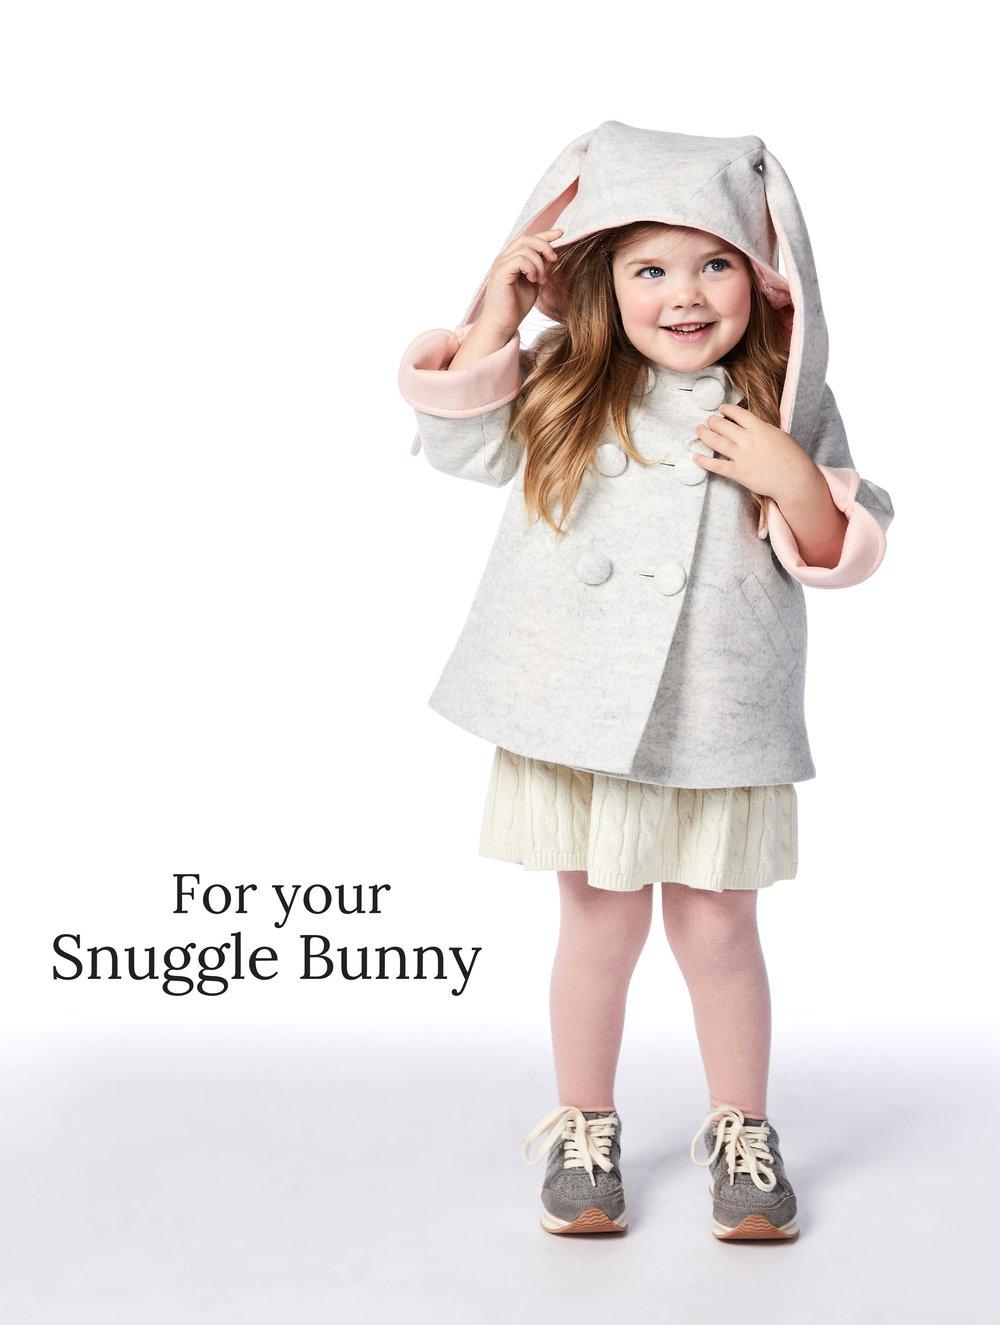 Snuggle Bunny.jpg